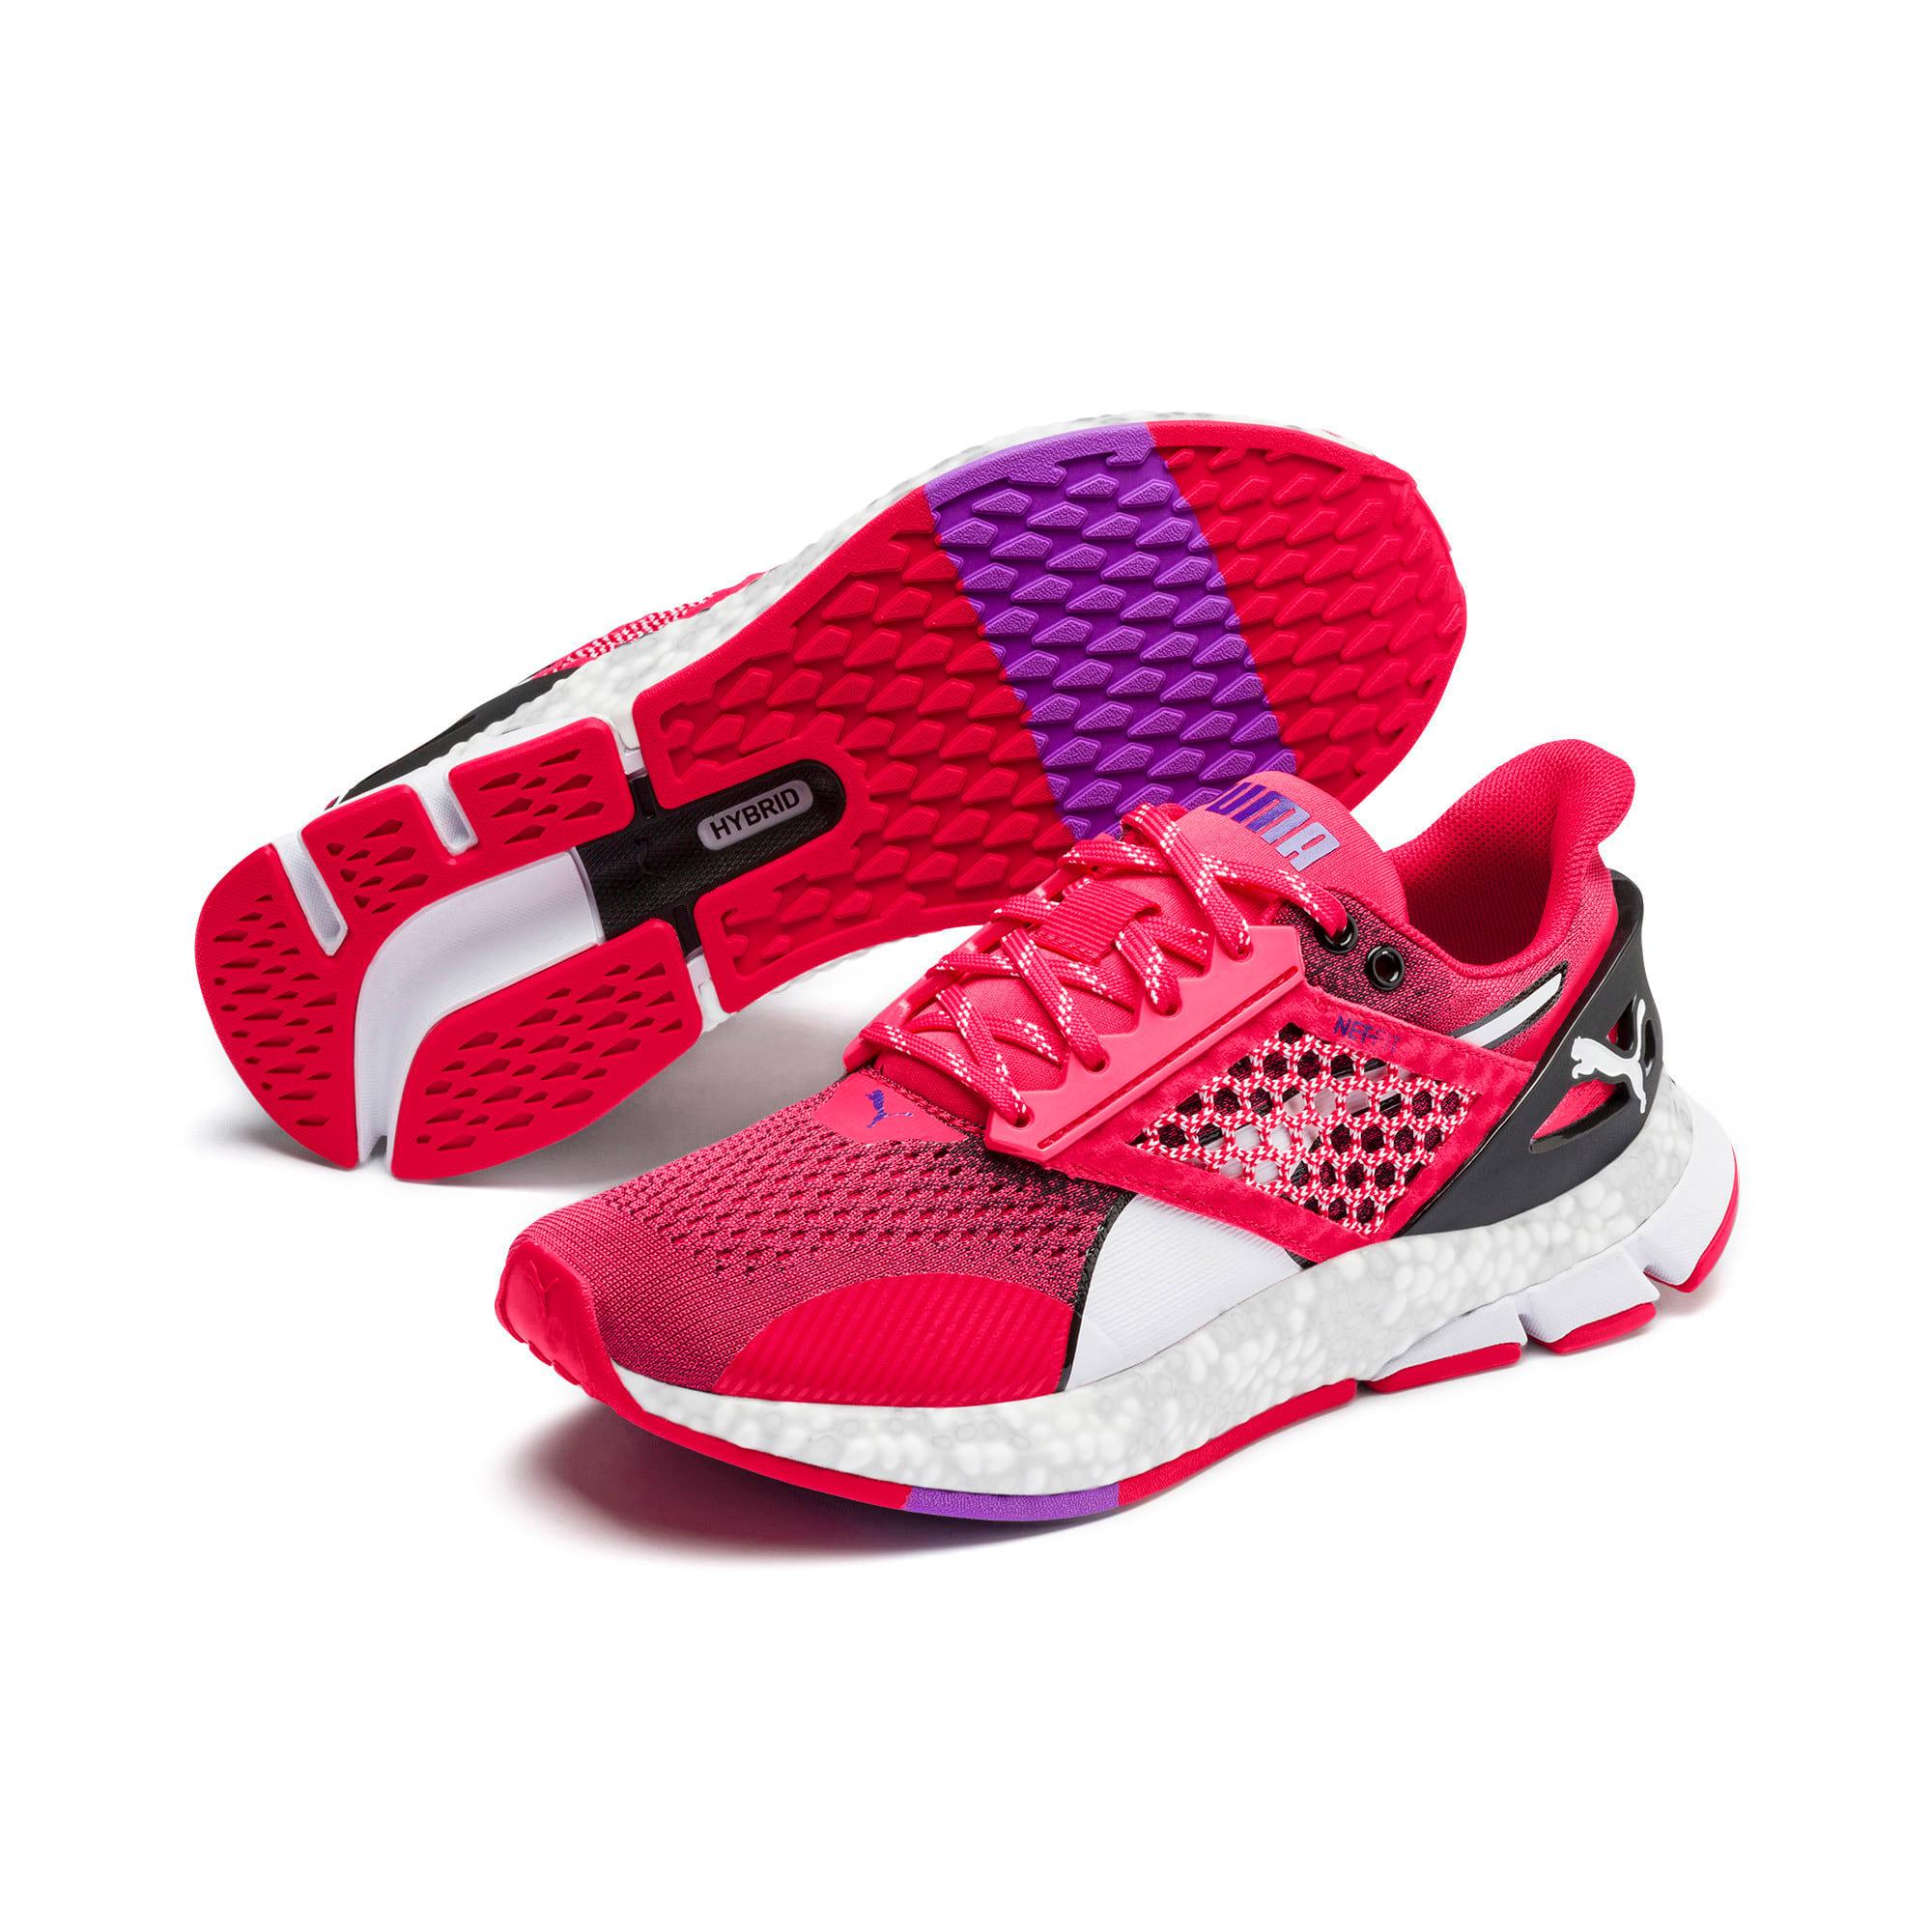 Thumbnail 3 of HYBRID Astro Women's Running Shoes, Nrgy Rose-Puma Black, medium